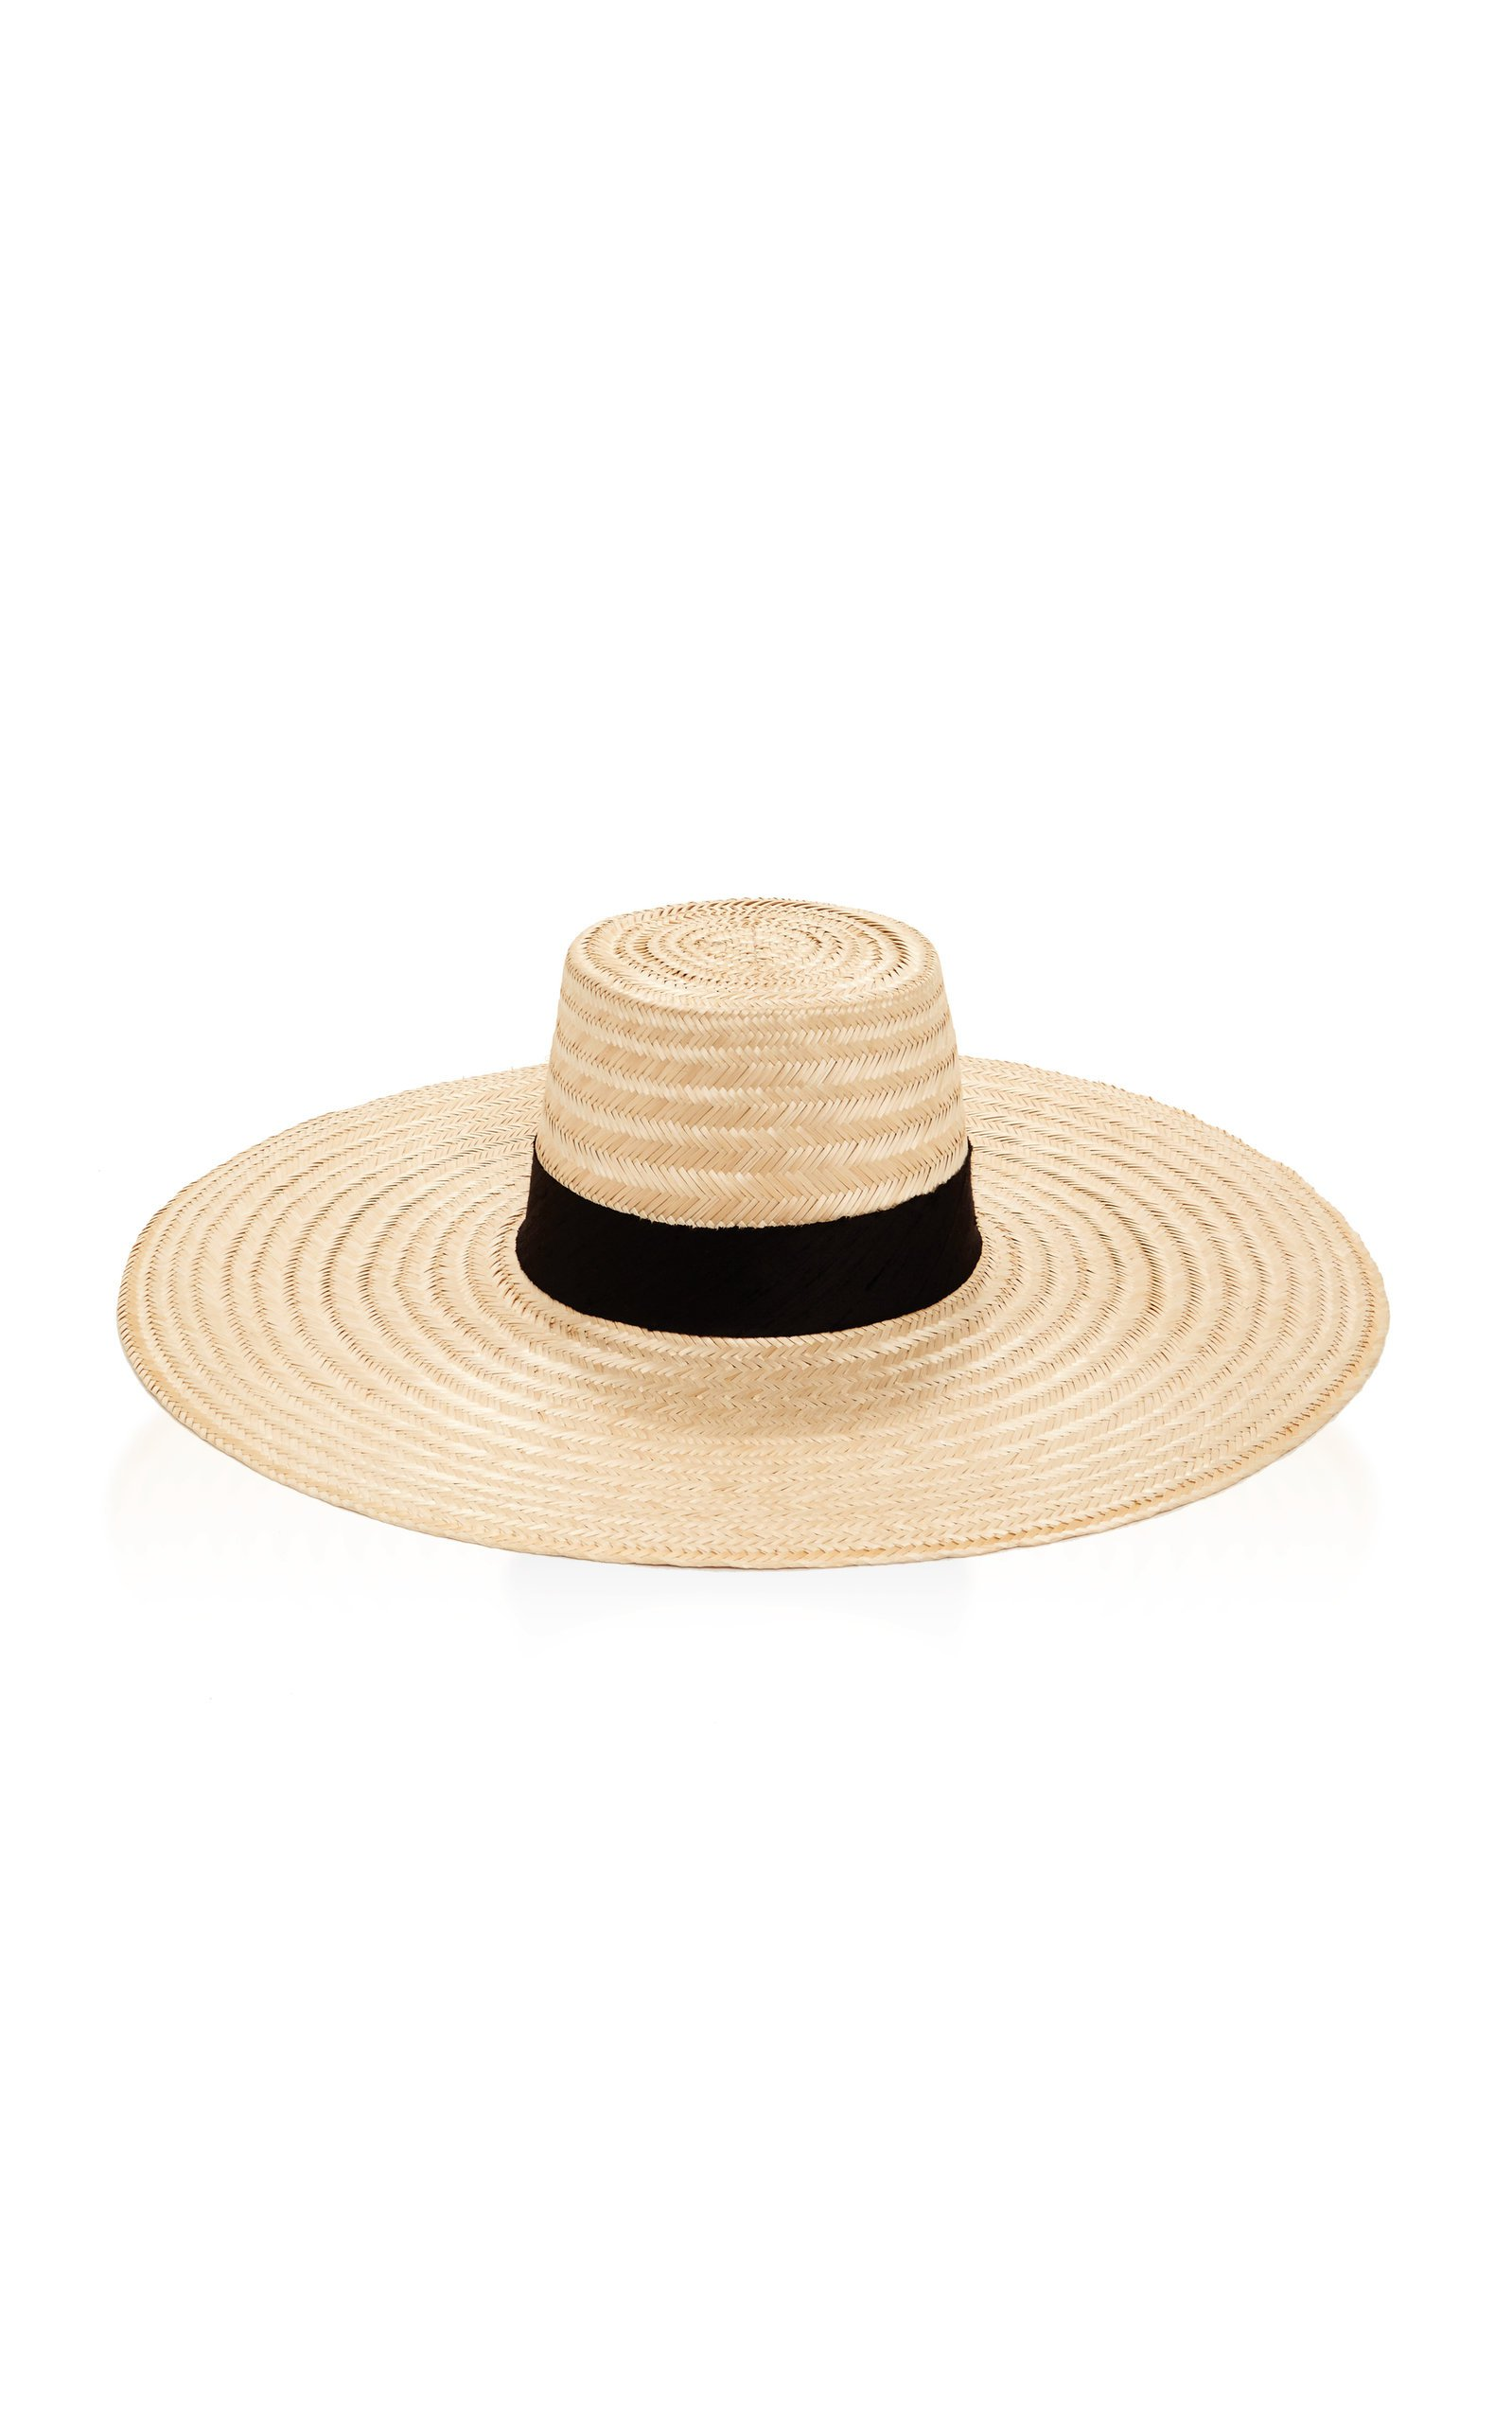 Janessa Leone Romy Silk-Trimmed Straw Hat